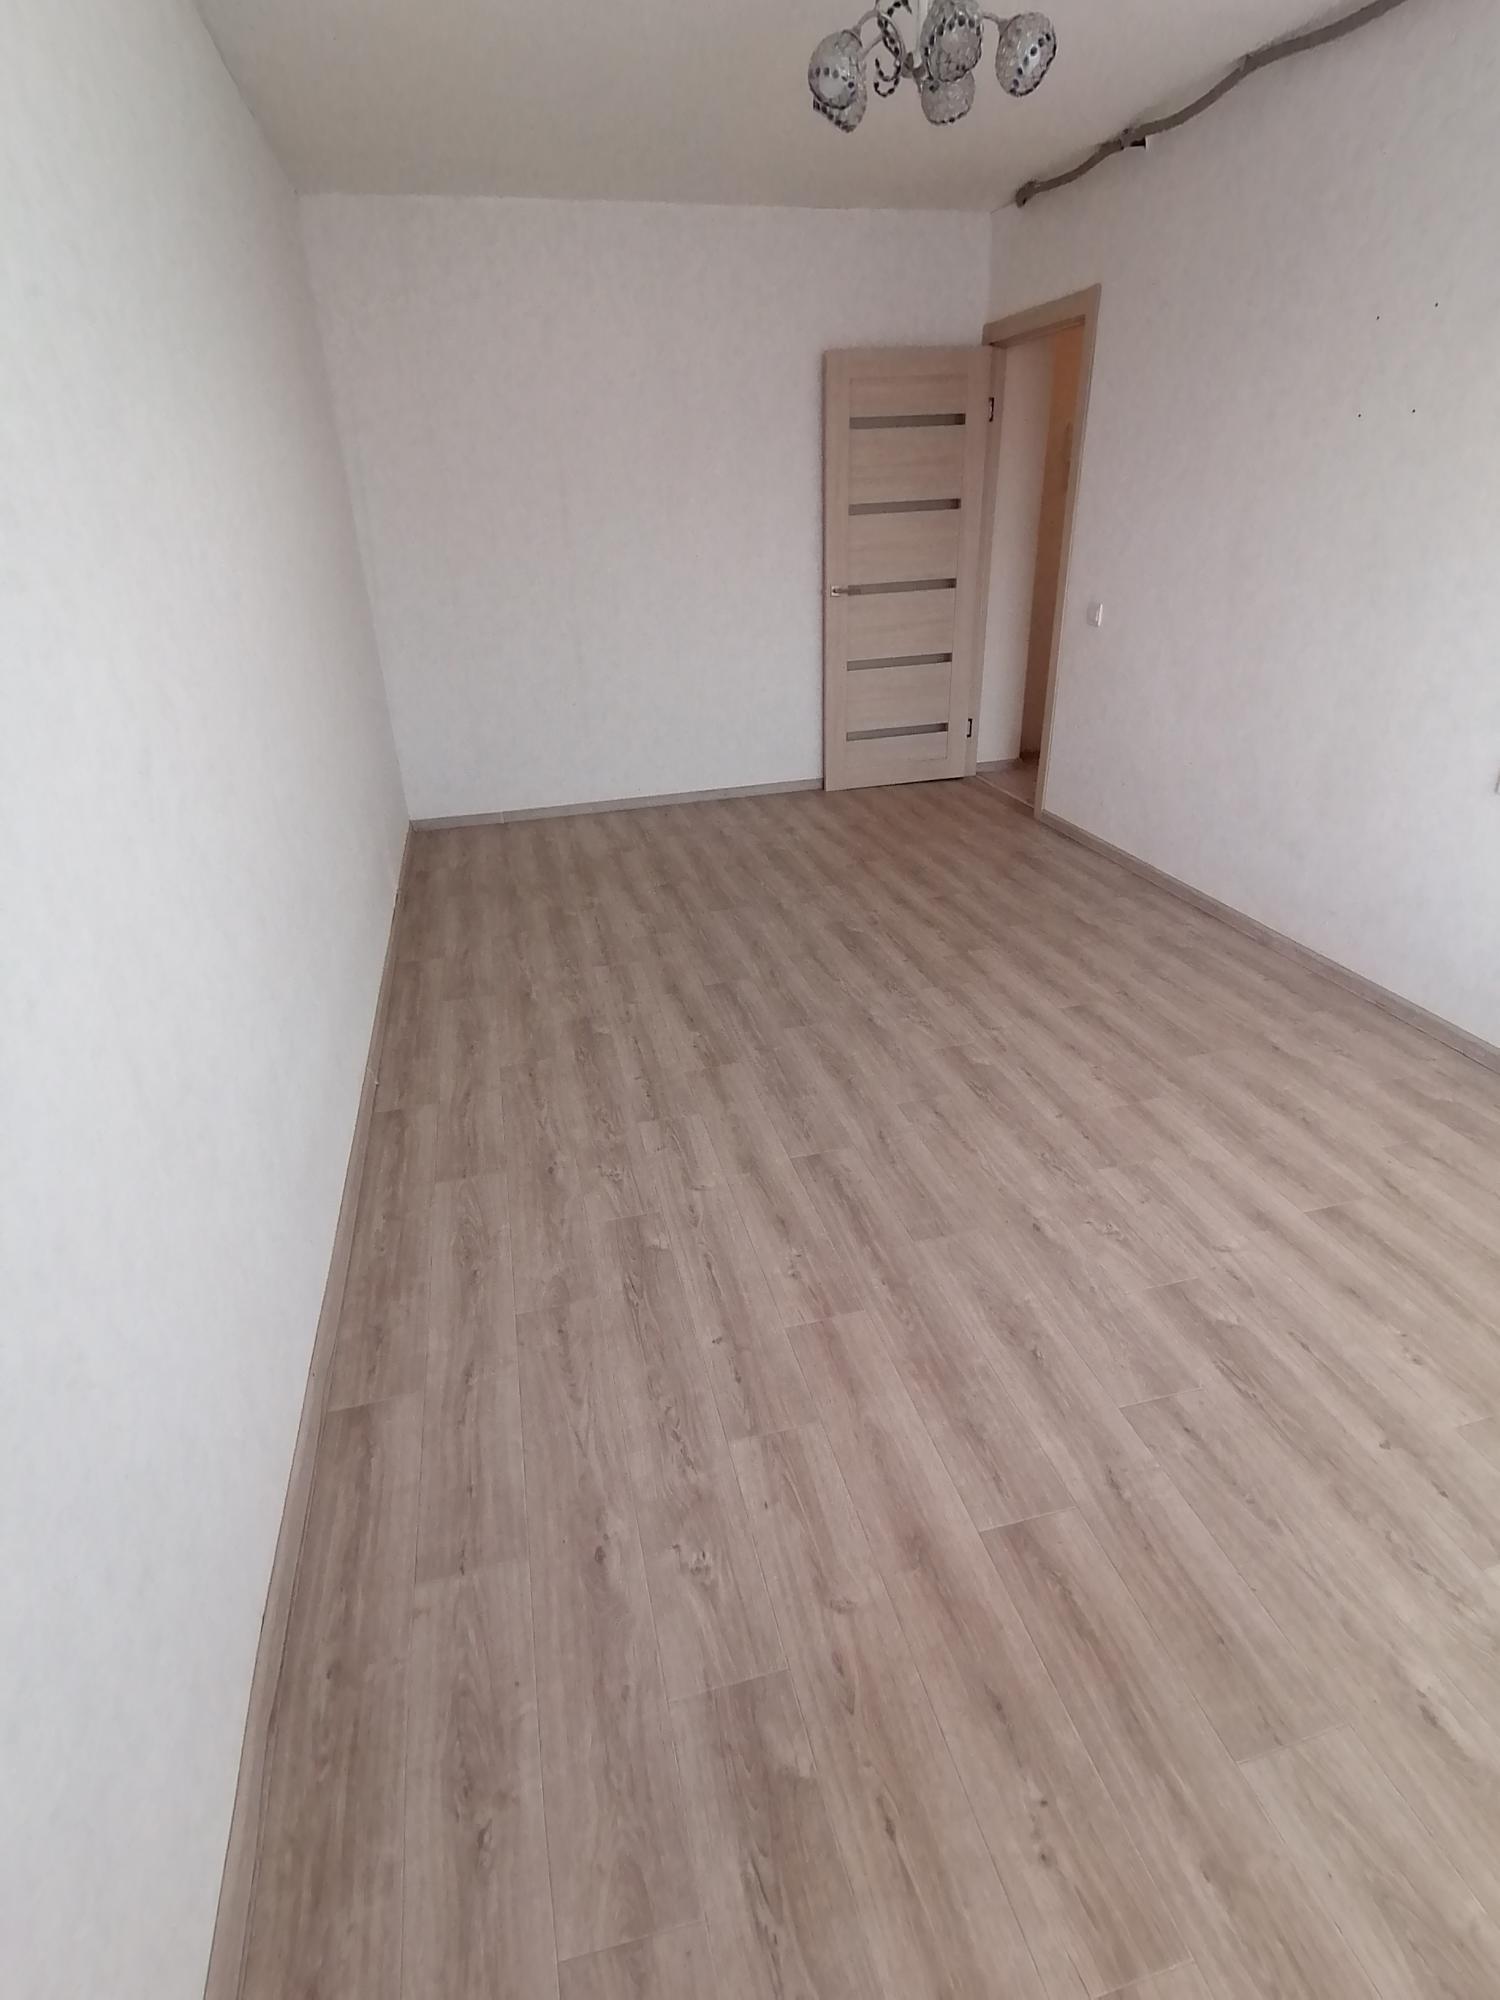 1к квартира улица Говорова, 54г | 14000 | аренда в Красноярске фото 0